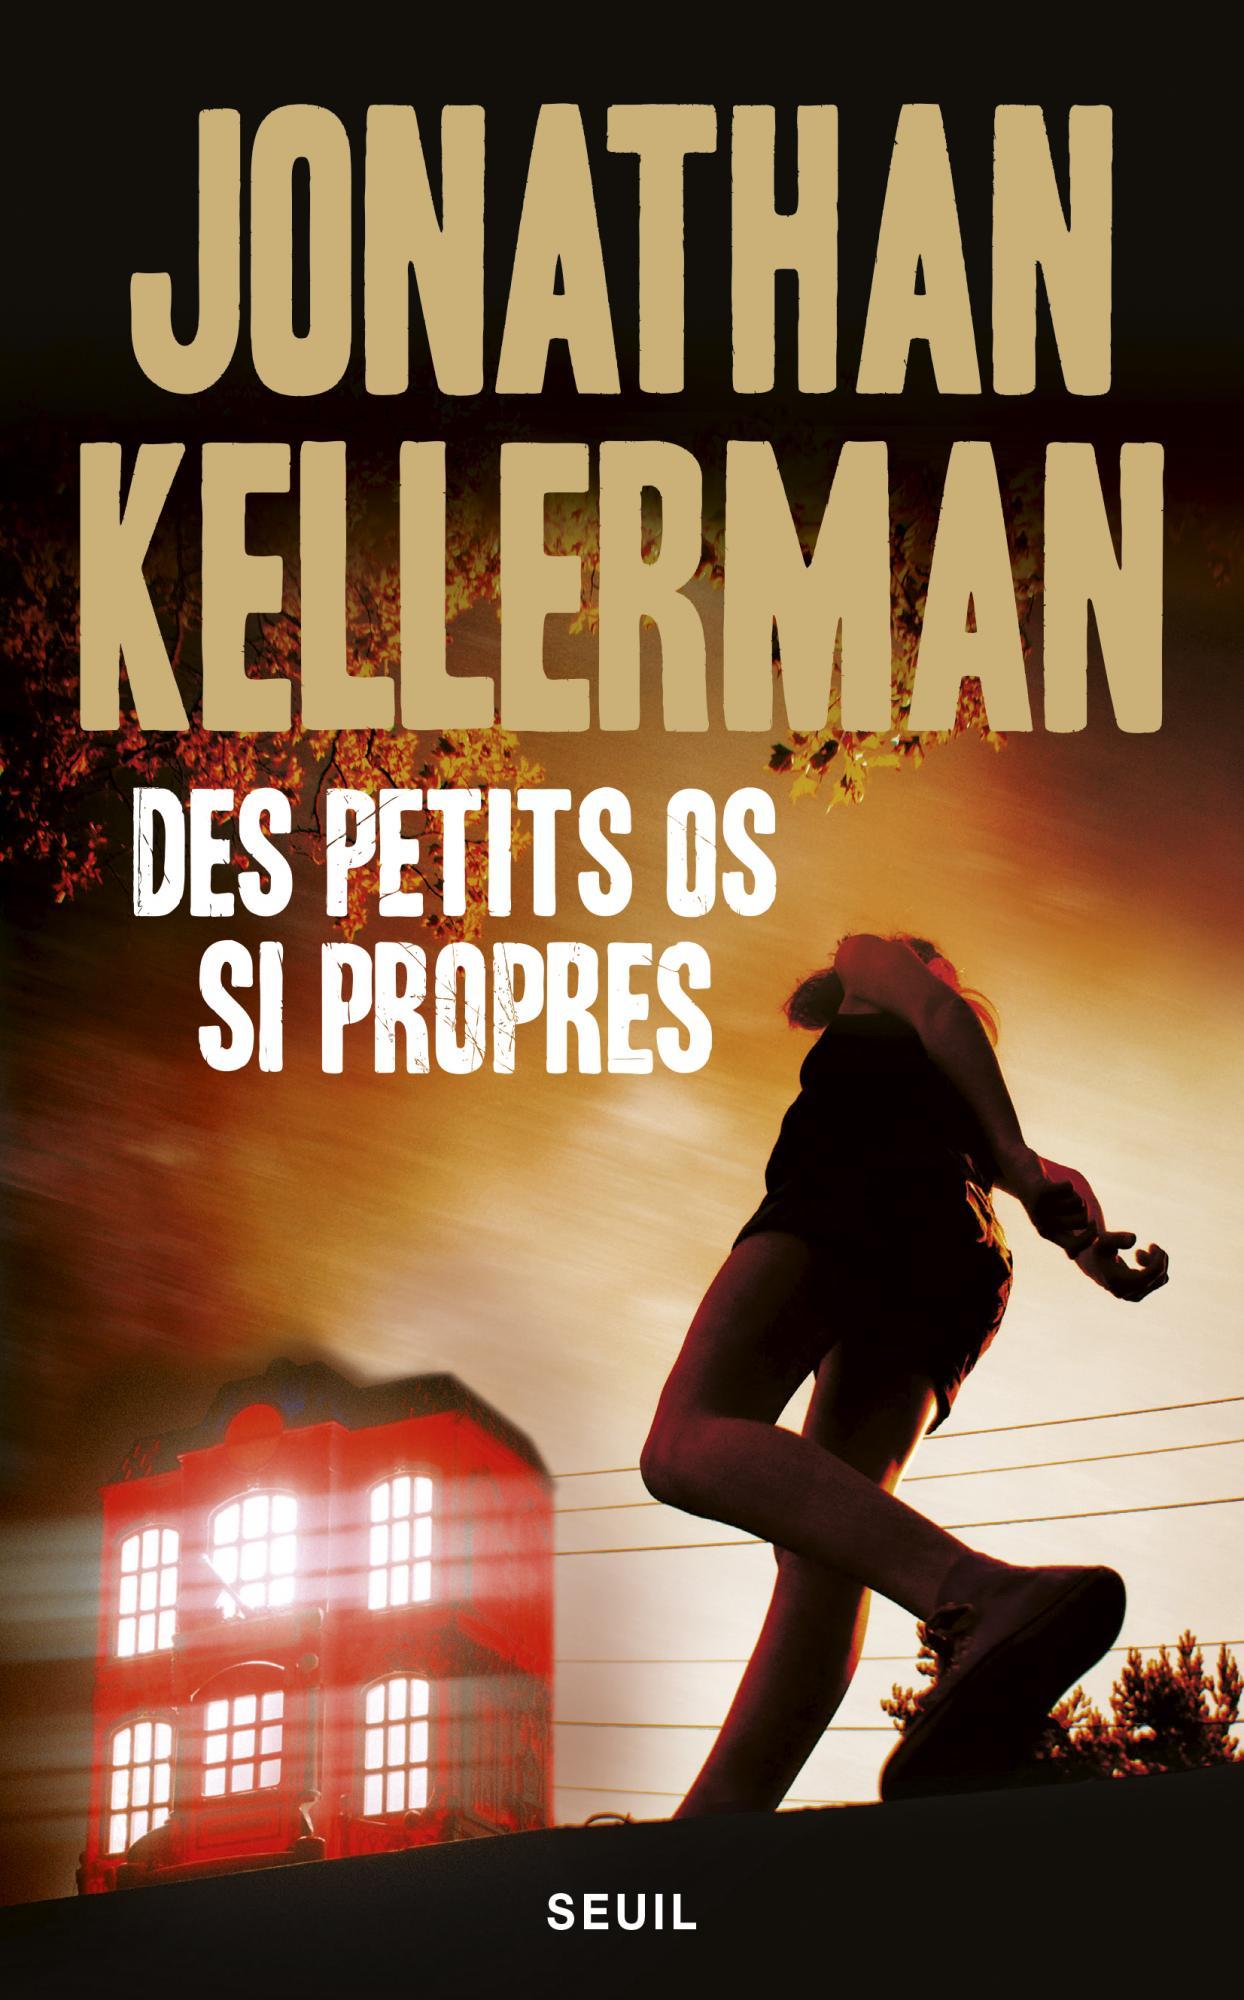 Des petits os si propres - Kellerman Jonathan